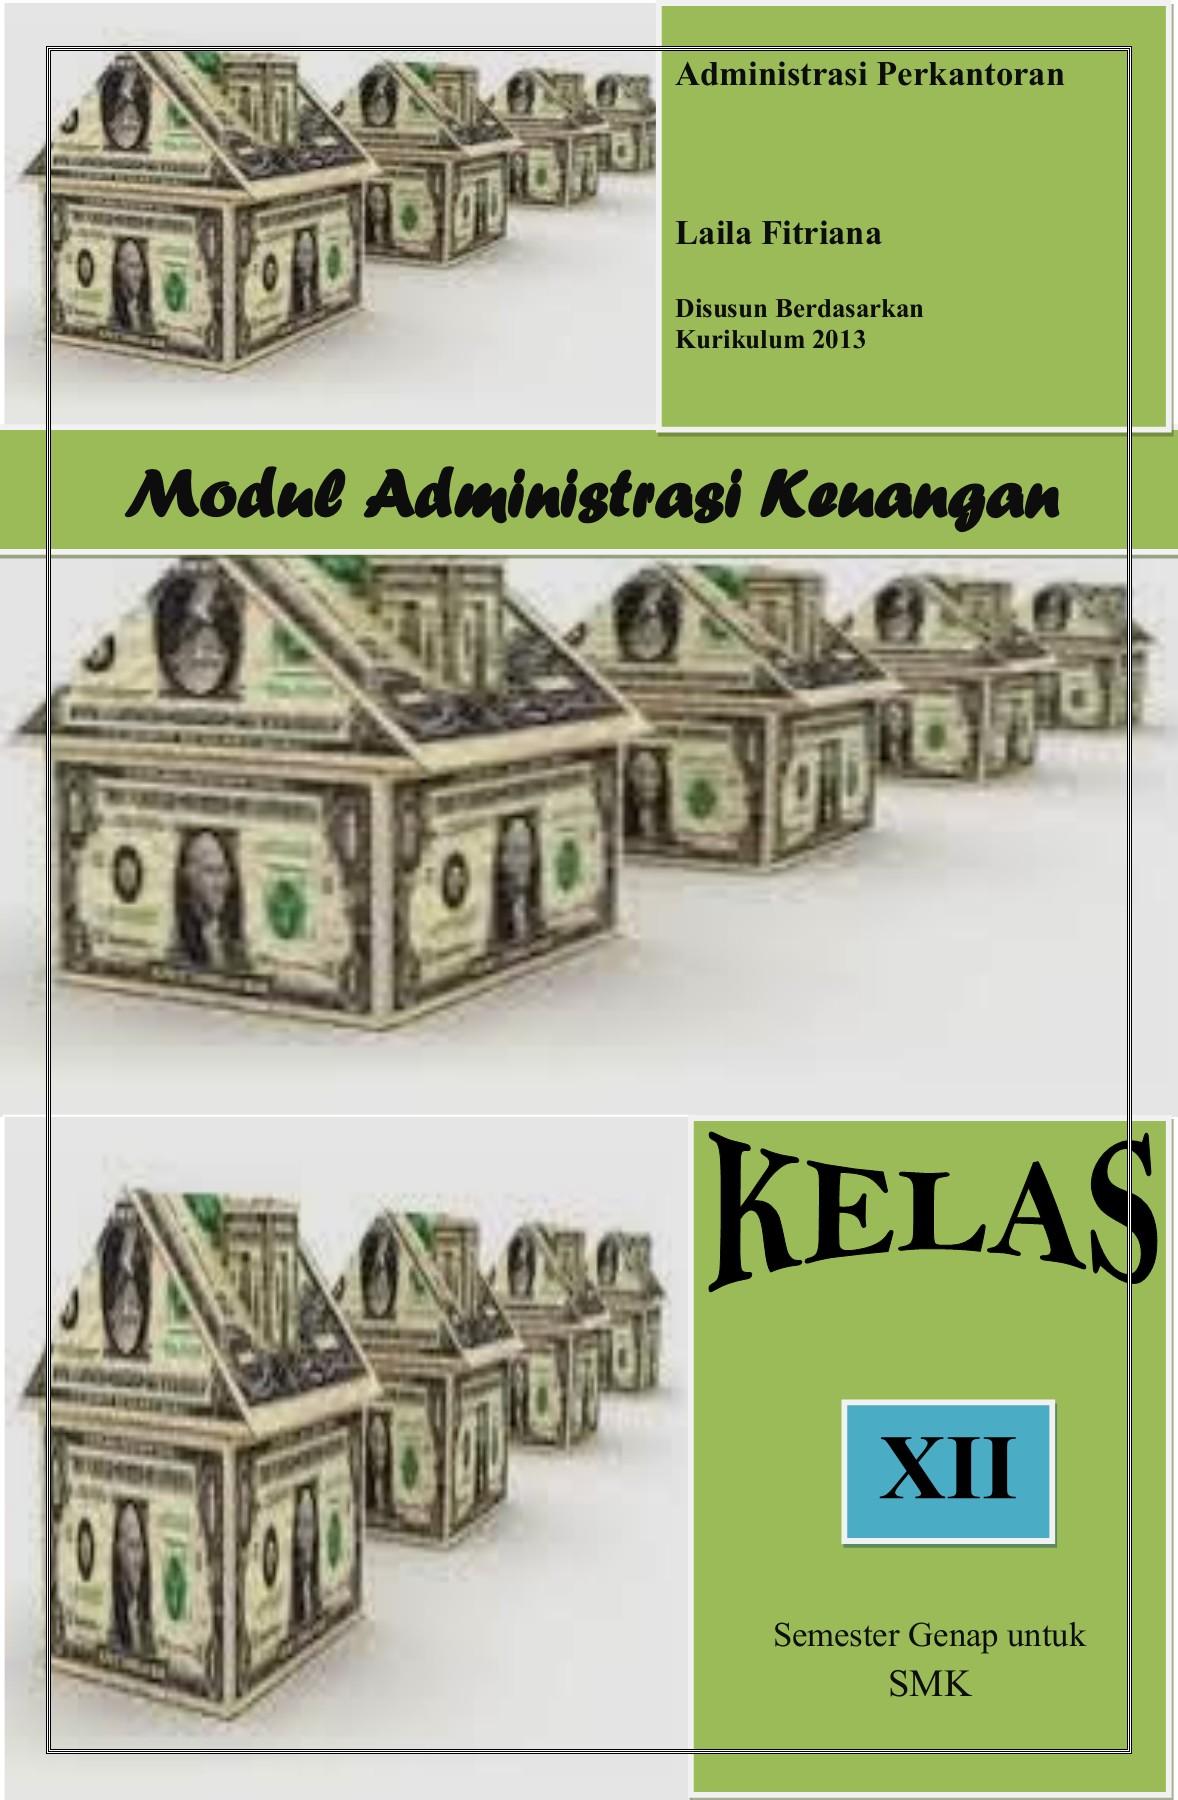 Modul Administrasi Umum : modul, administrasi, Modul-administrasi-perkantoran-laila-fitriana